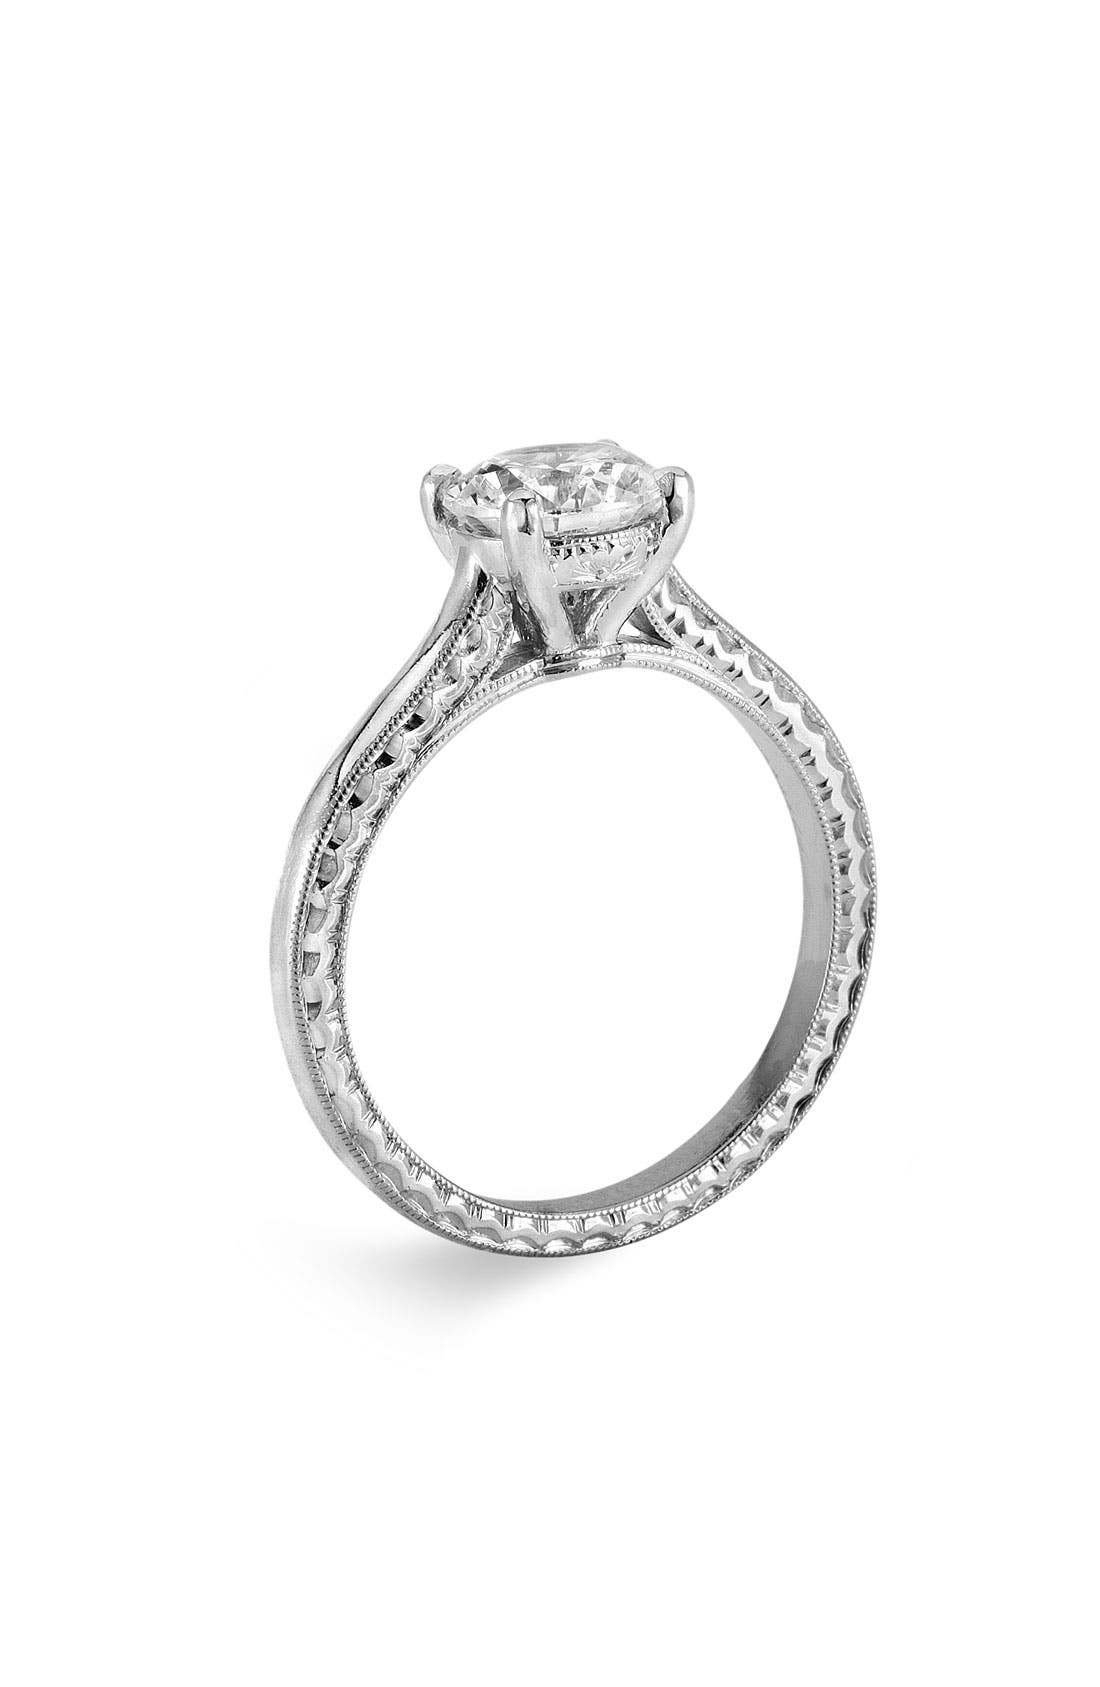 Alternate Image 1 Selected - Jack Kelége 'Silhouette' Engagement Ring Setting